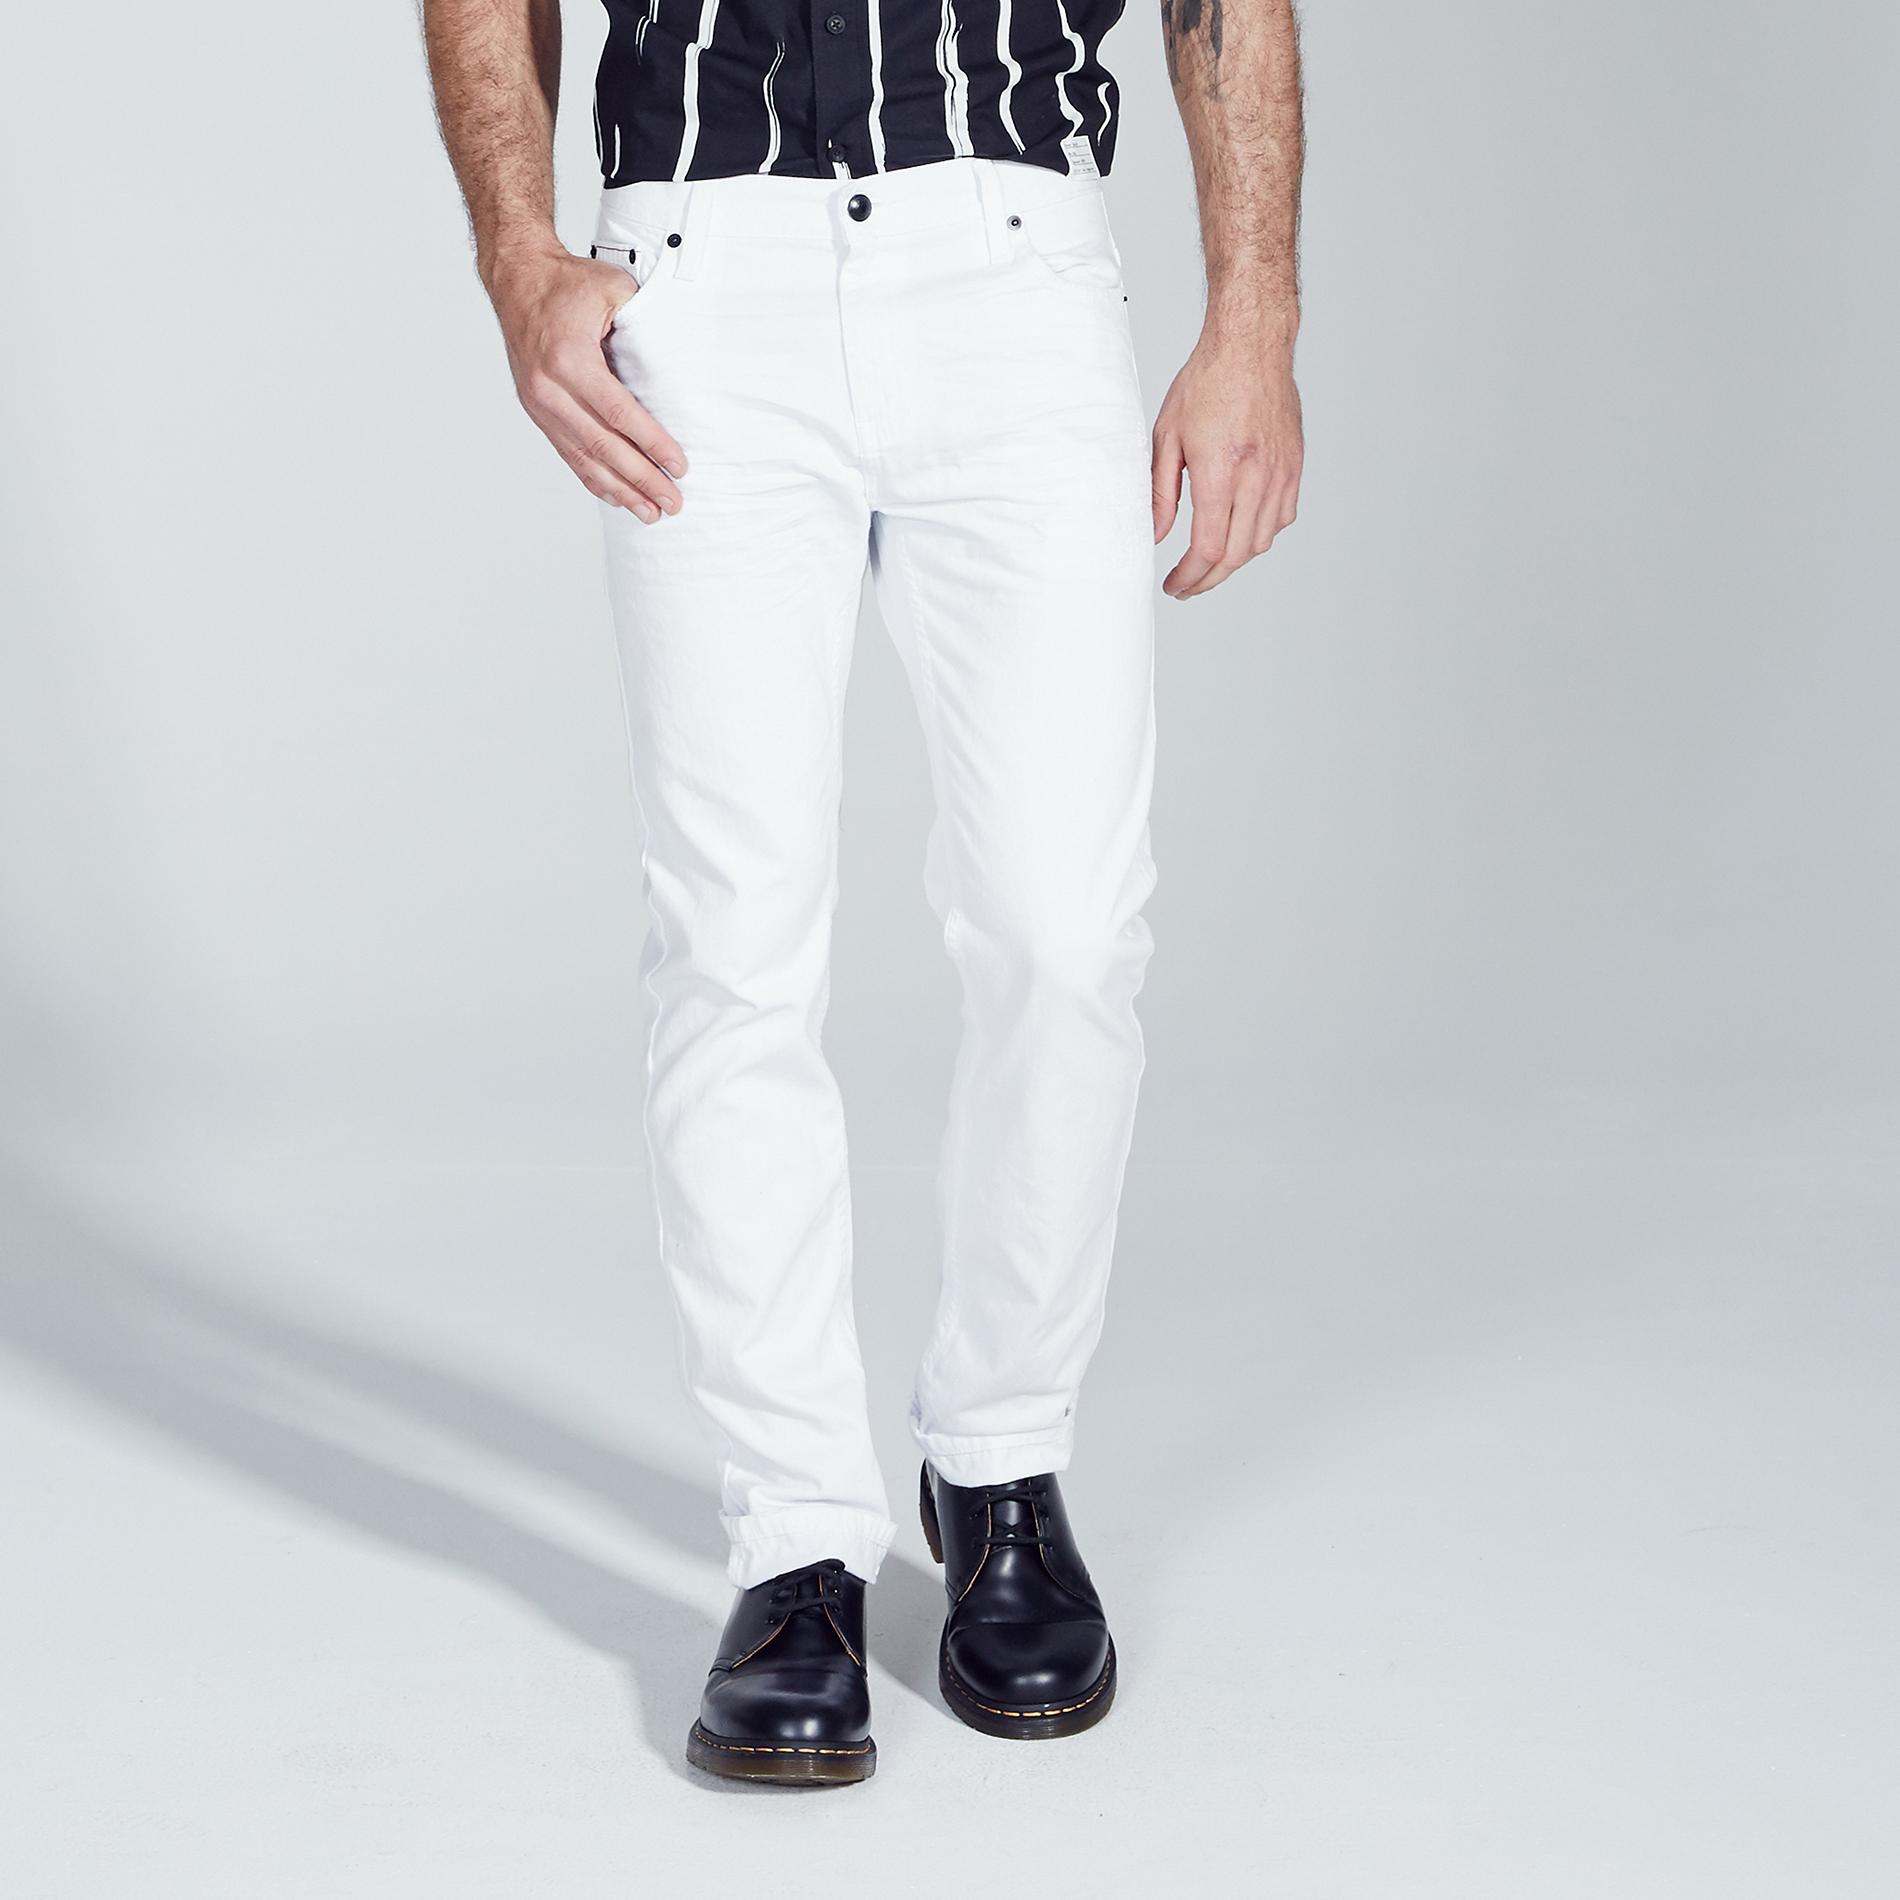 Adam Levine Men's White Wash Destructed Jeans